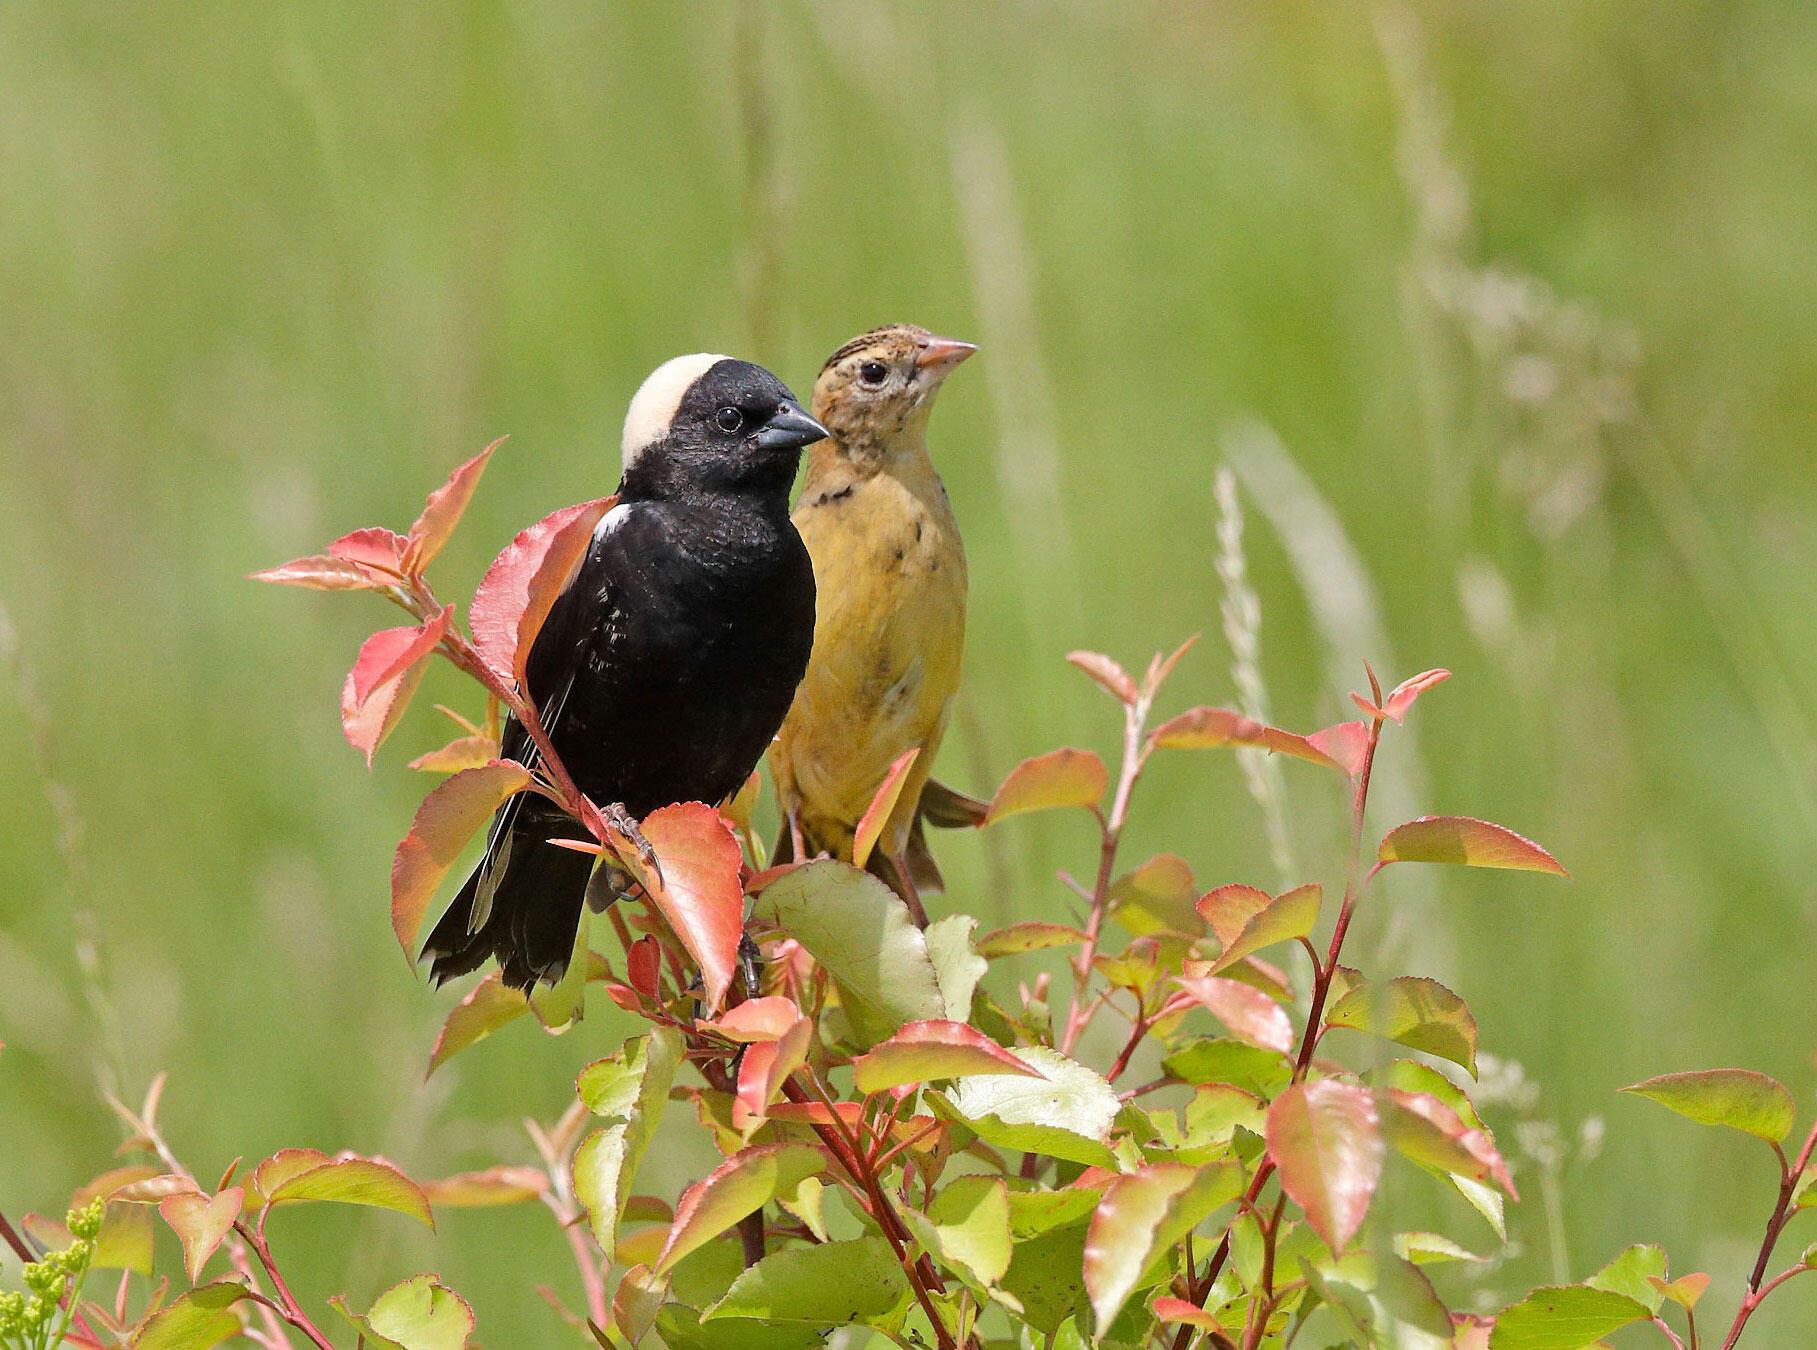 Bobolinks. Ruhikanta Meetei/Audubon Photography Awards